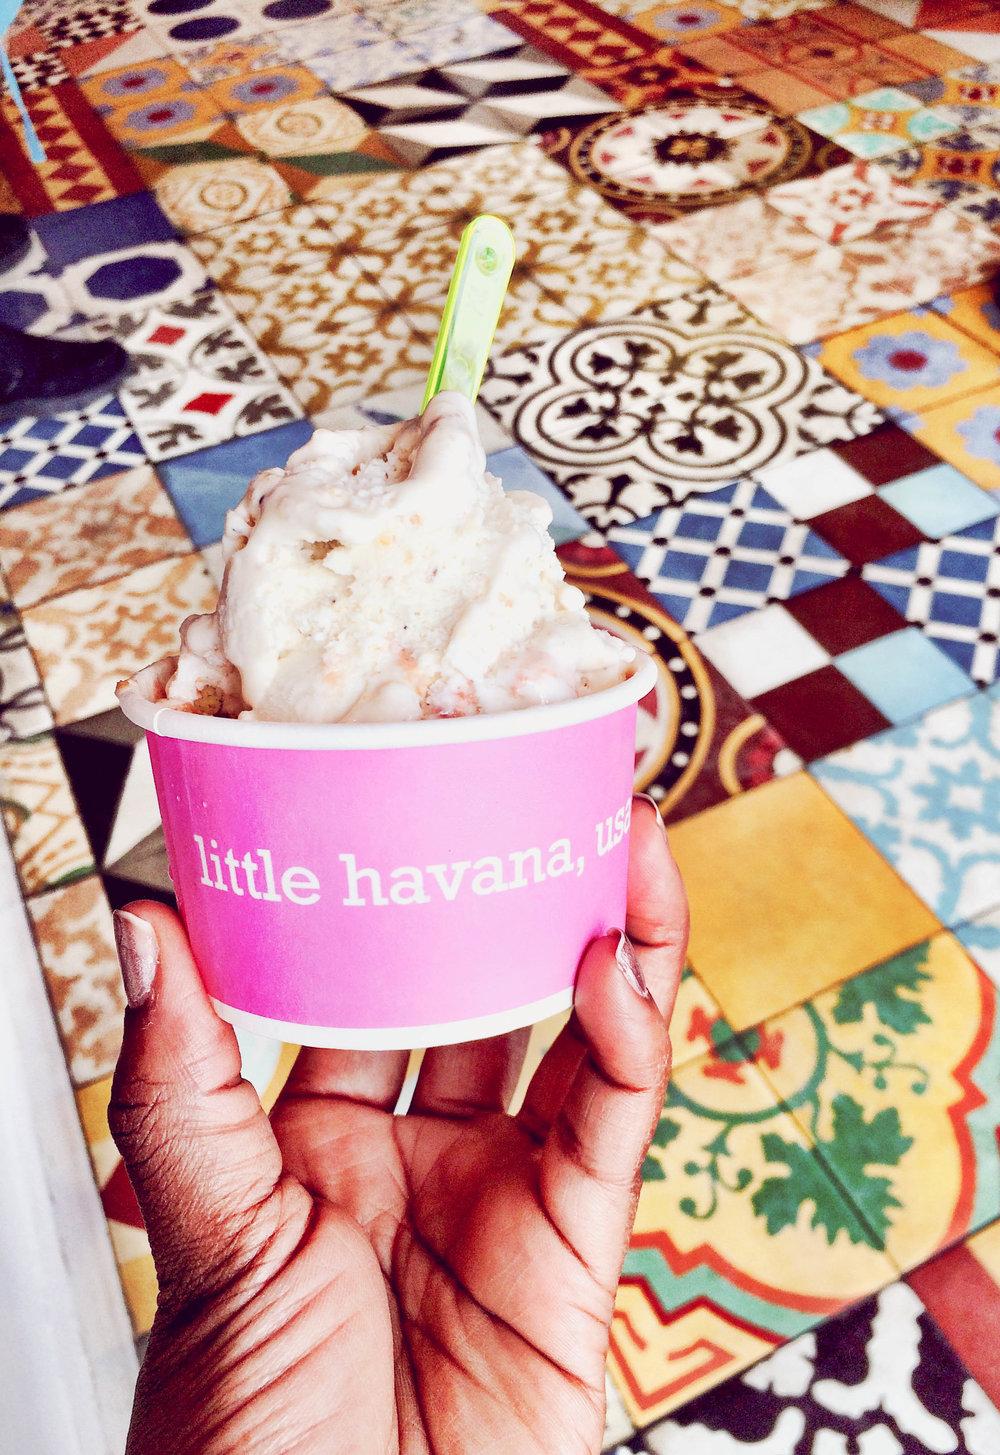 Azucar ice cream factory